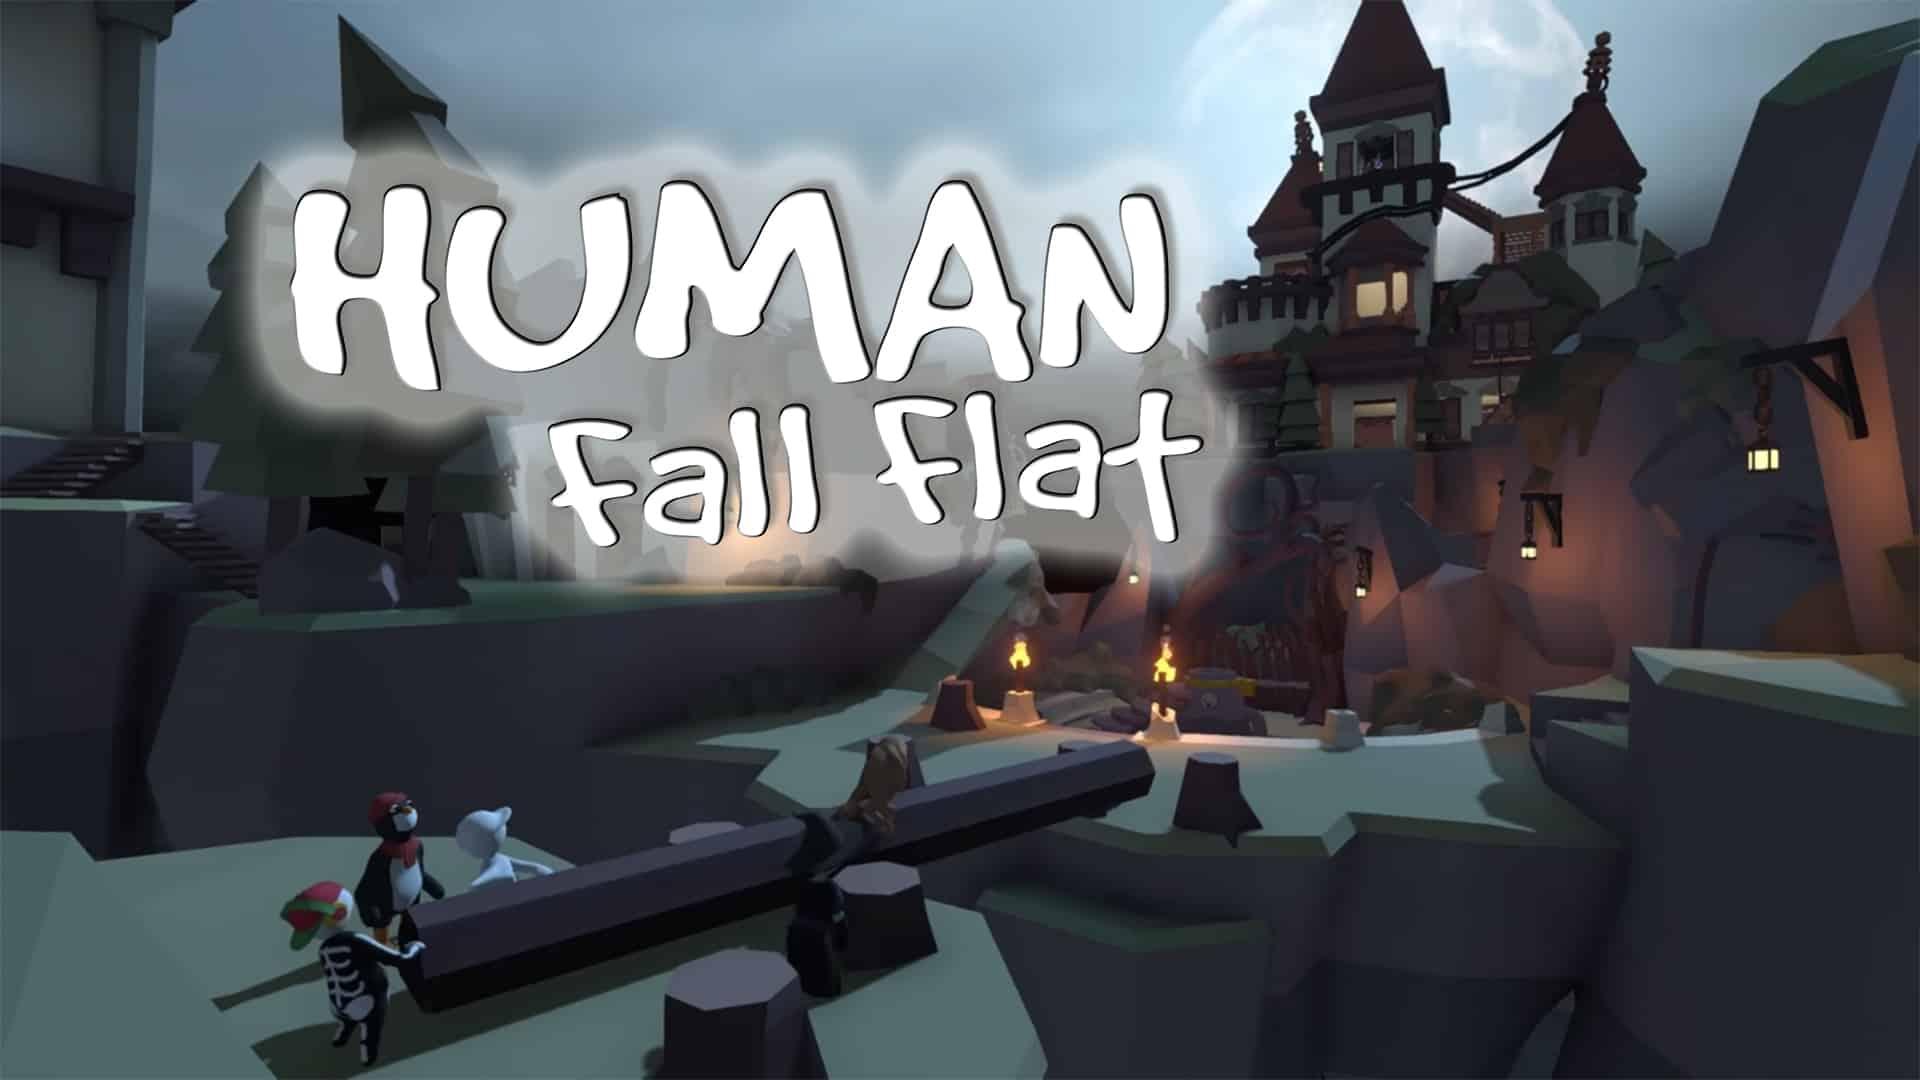 Nuevo nivel nocturno agregado a Humano: Fall Flat